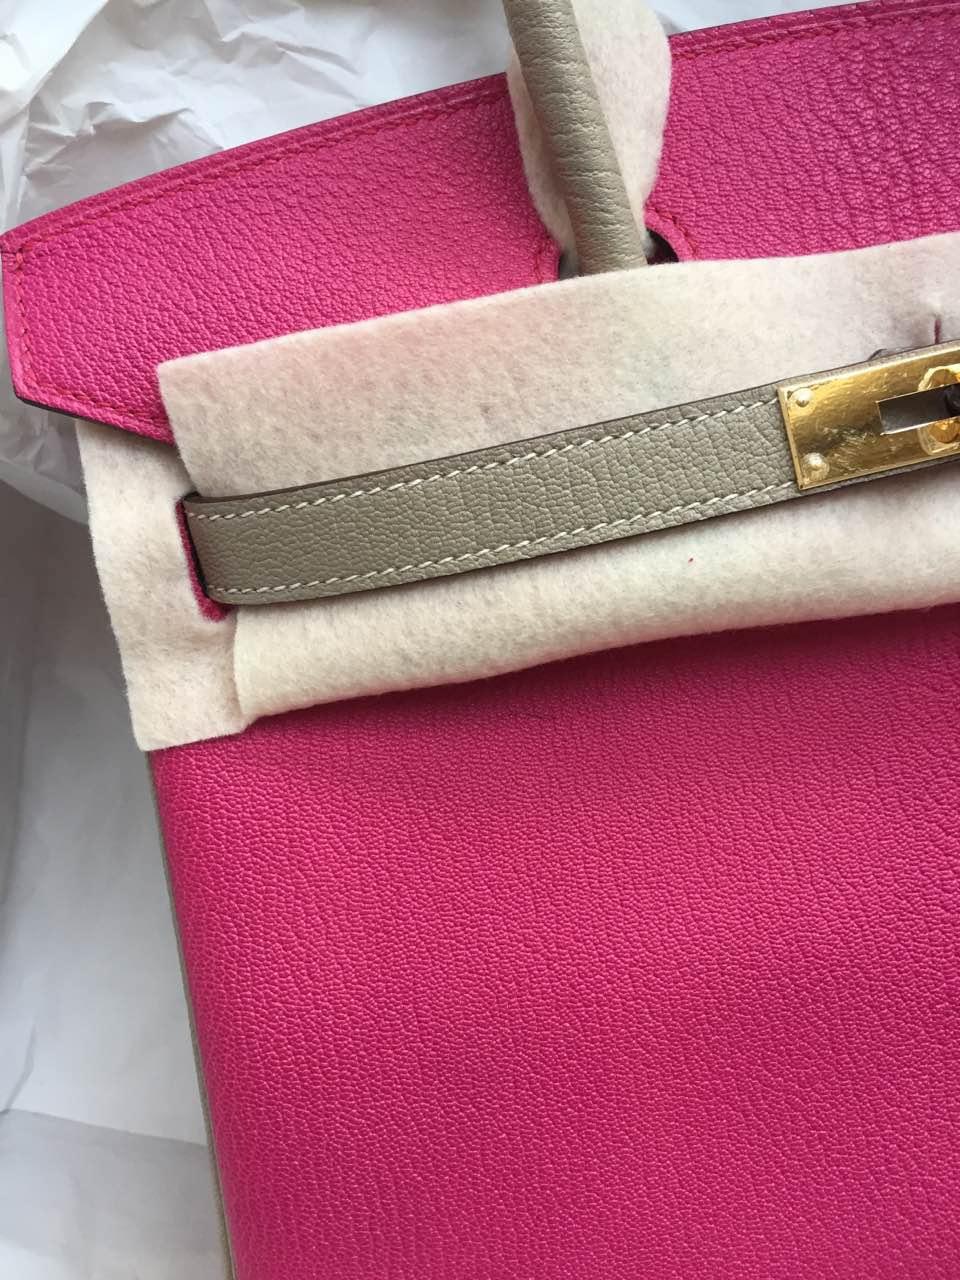 30cm Hermes Birkin Bag E5 Rose Tyrien/Light Grey Chevre Leather Tote Bag